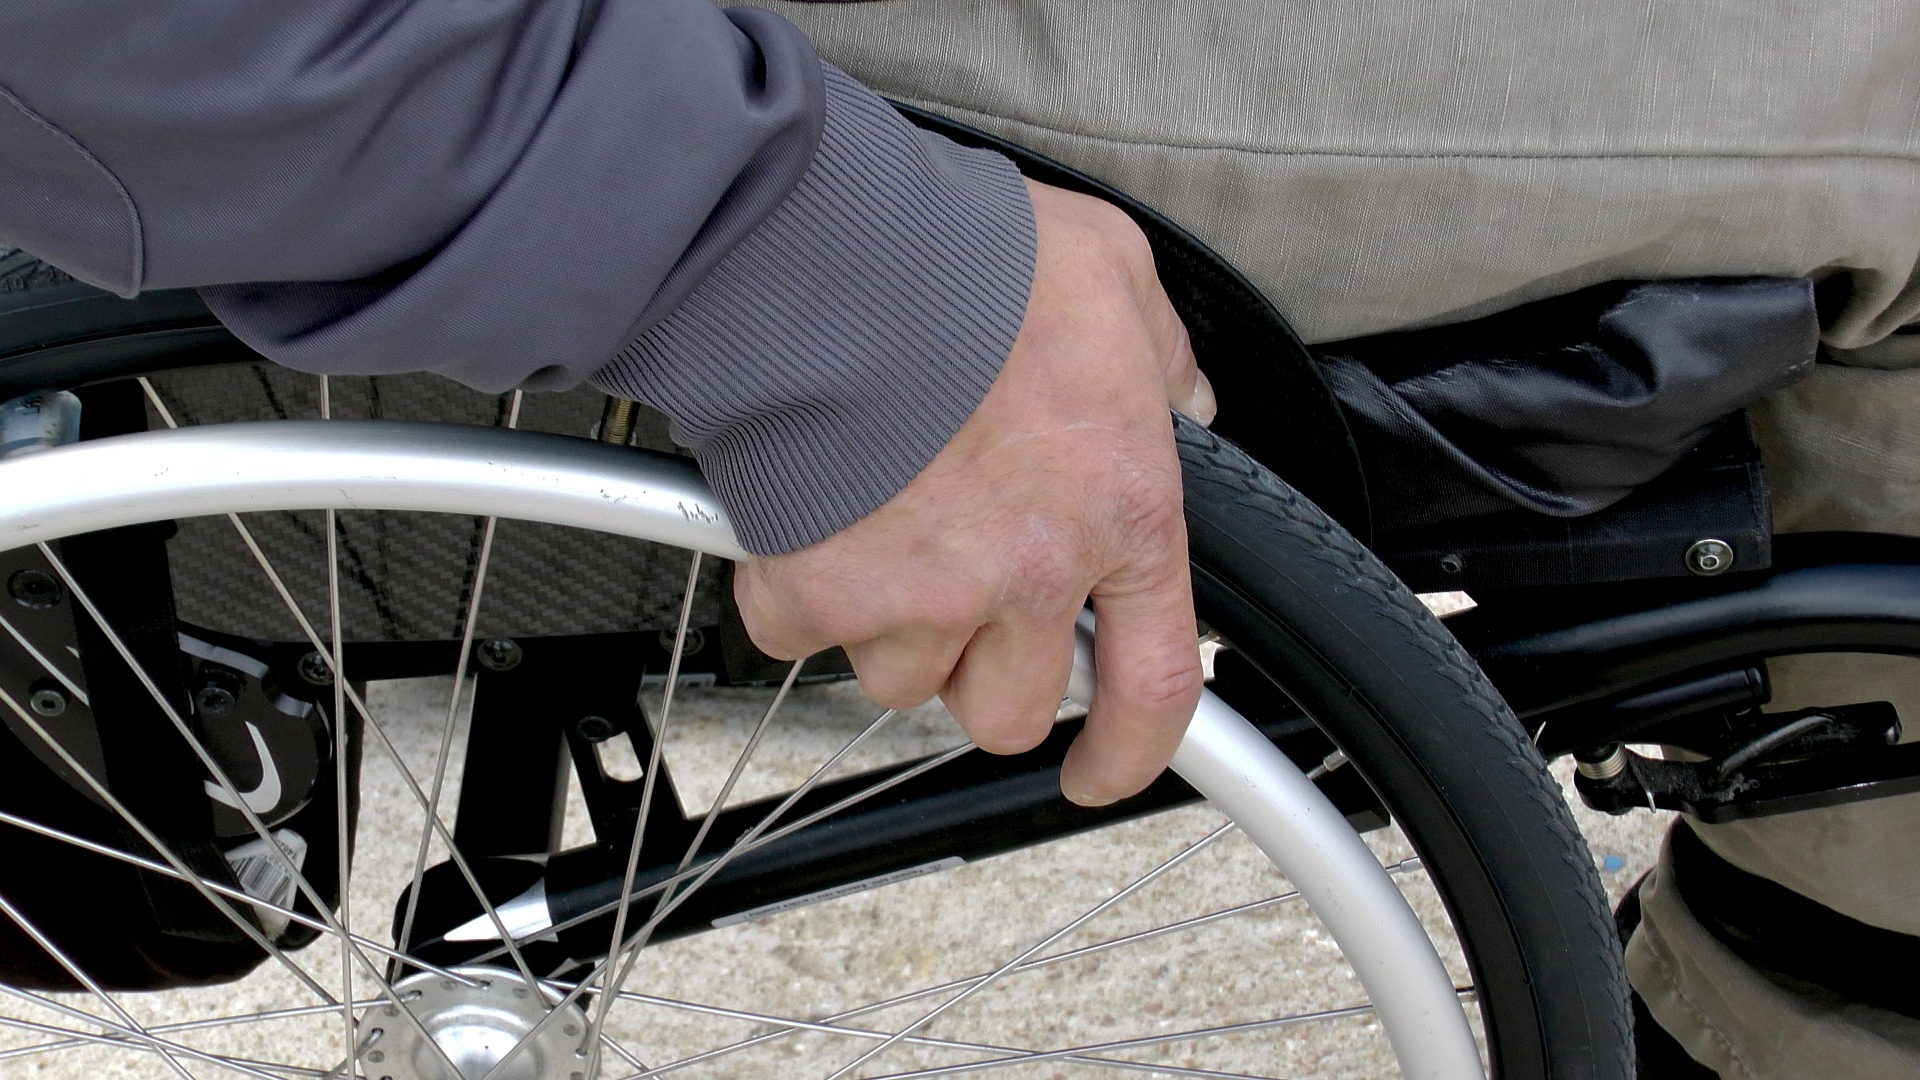 Fiioterapia y Esclerosis Múltiple